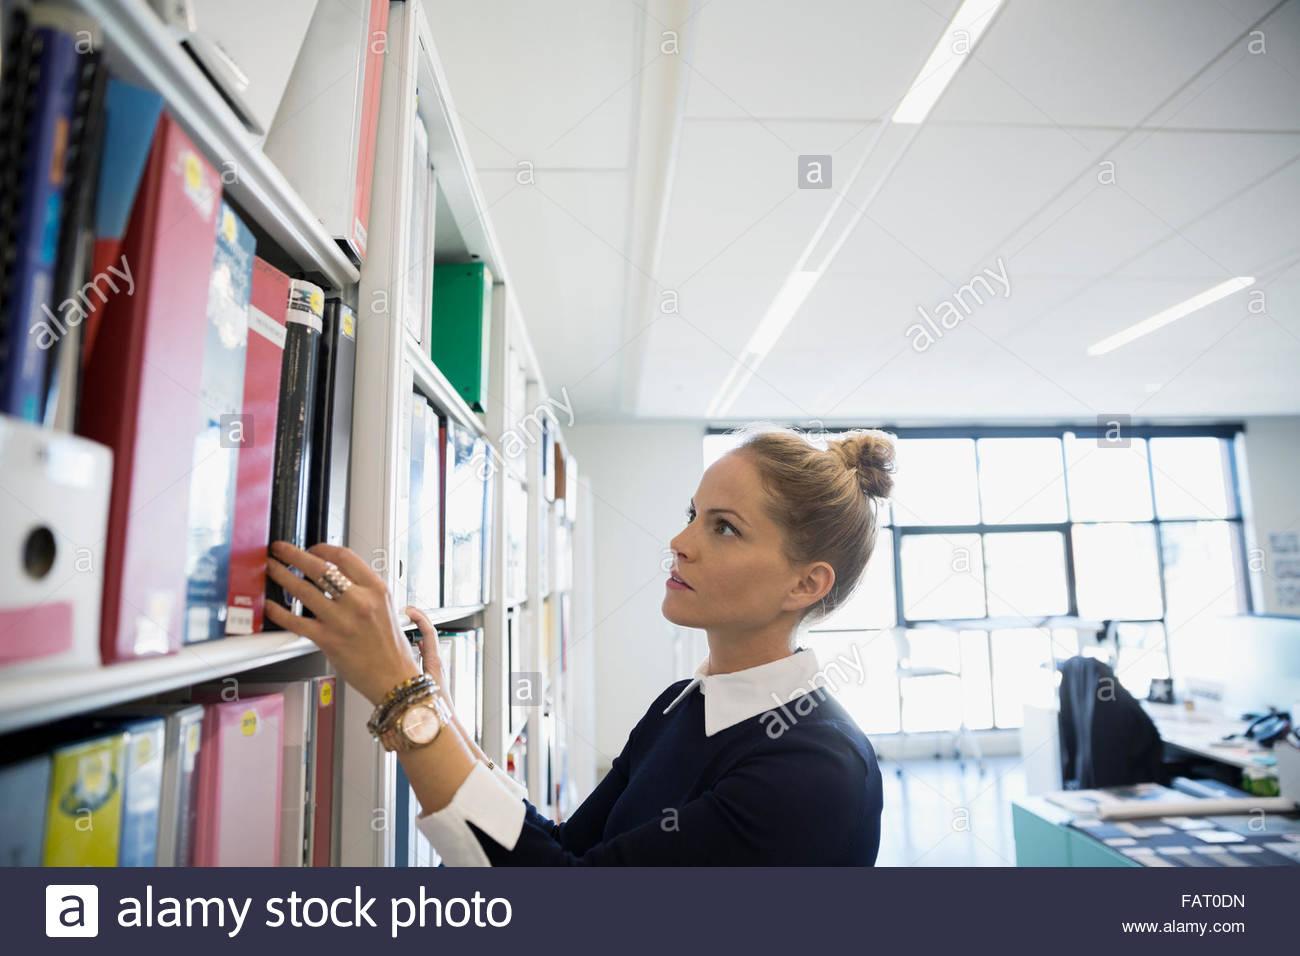 Arquitecto buscando libro en biblioteca de Office Imagen De Stock